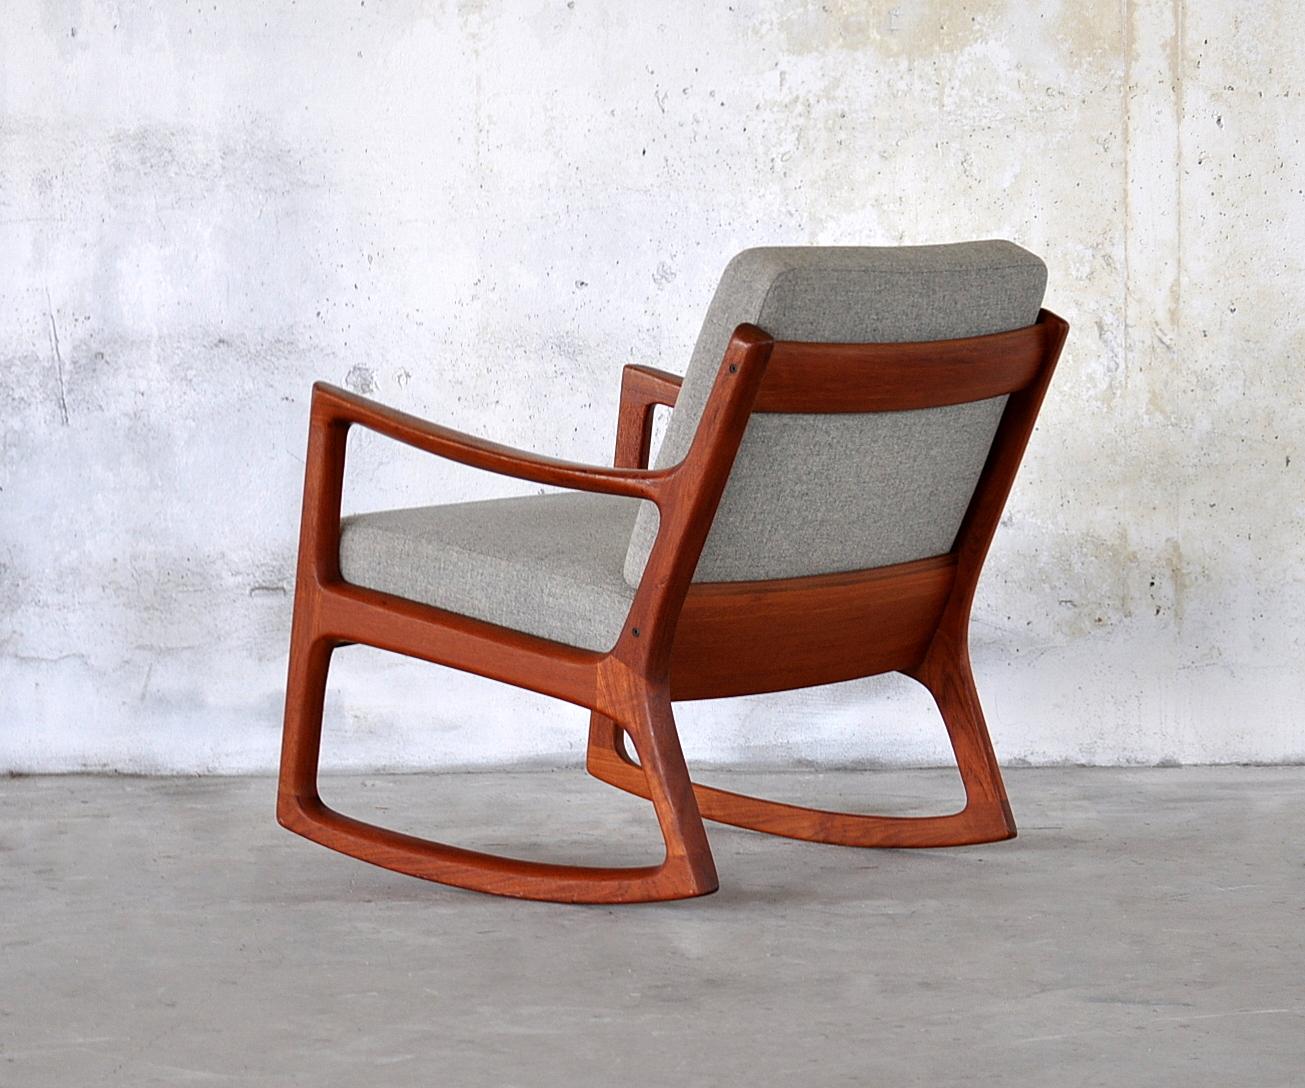 Contempory Chairs: SELECT MODERN: Ole Wanscher Teak Rocking Chair